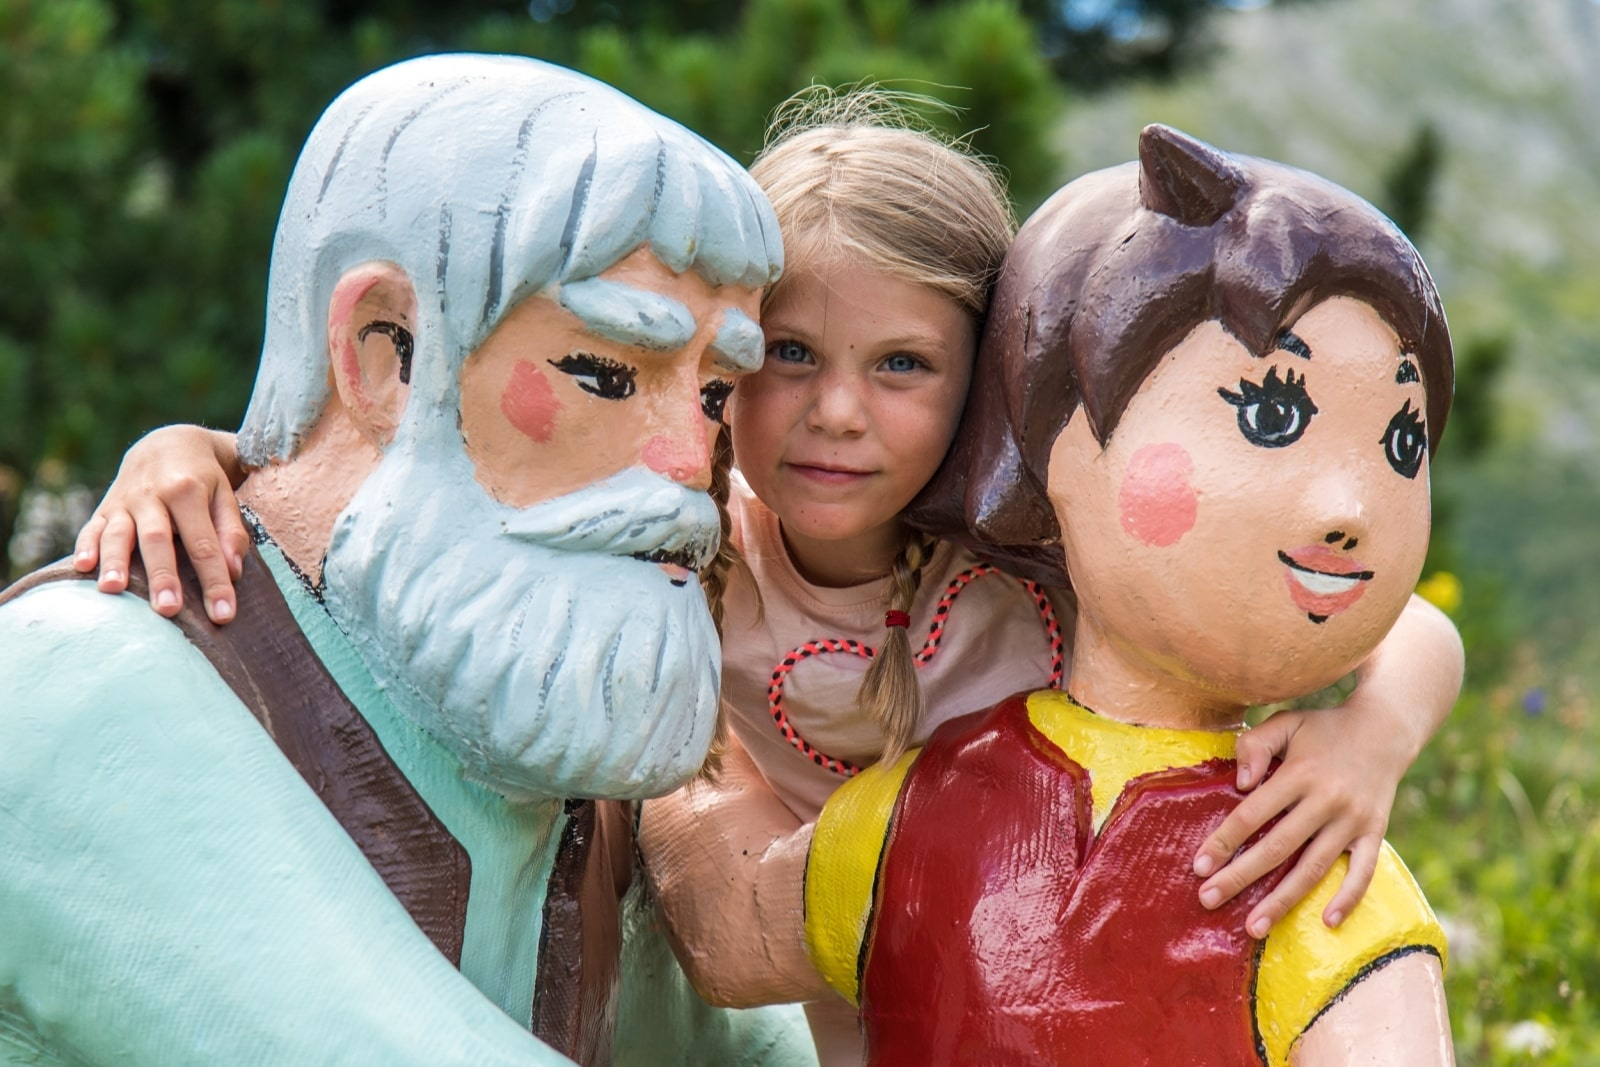 Heidi-Chalet-Falkert-Heidialm-Falkertsee-Kinder-Liebe